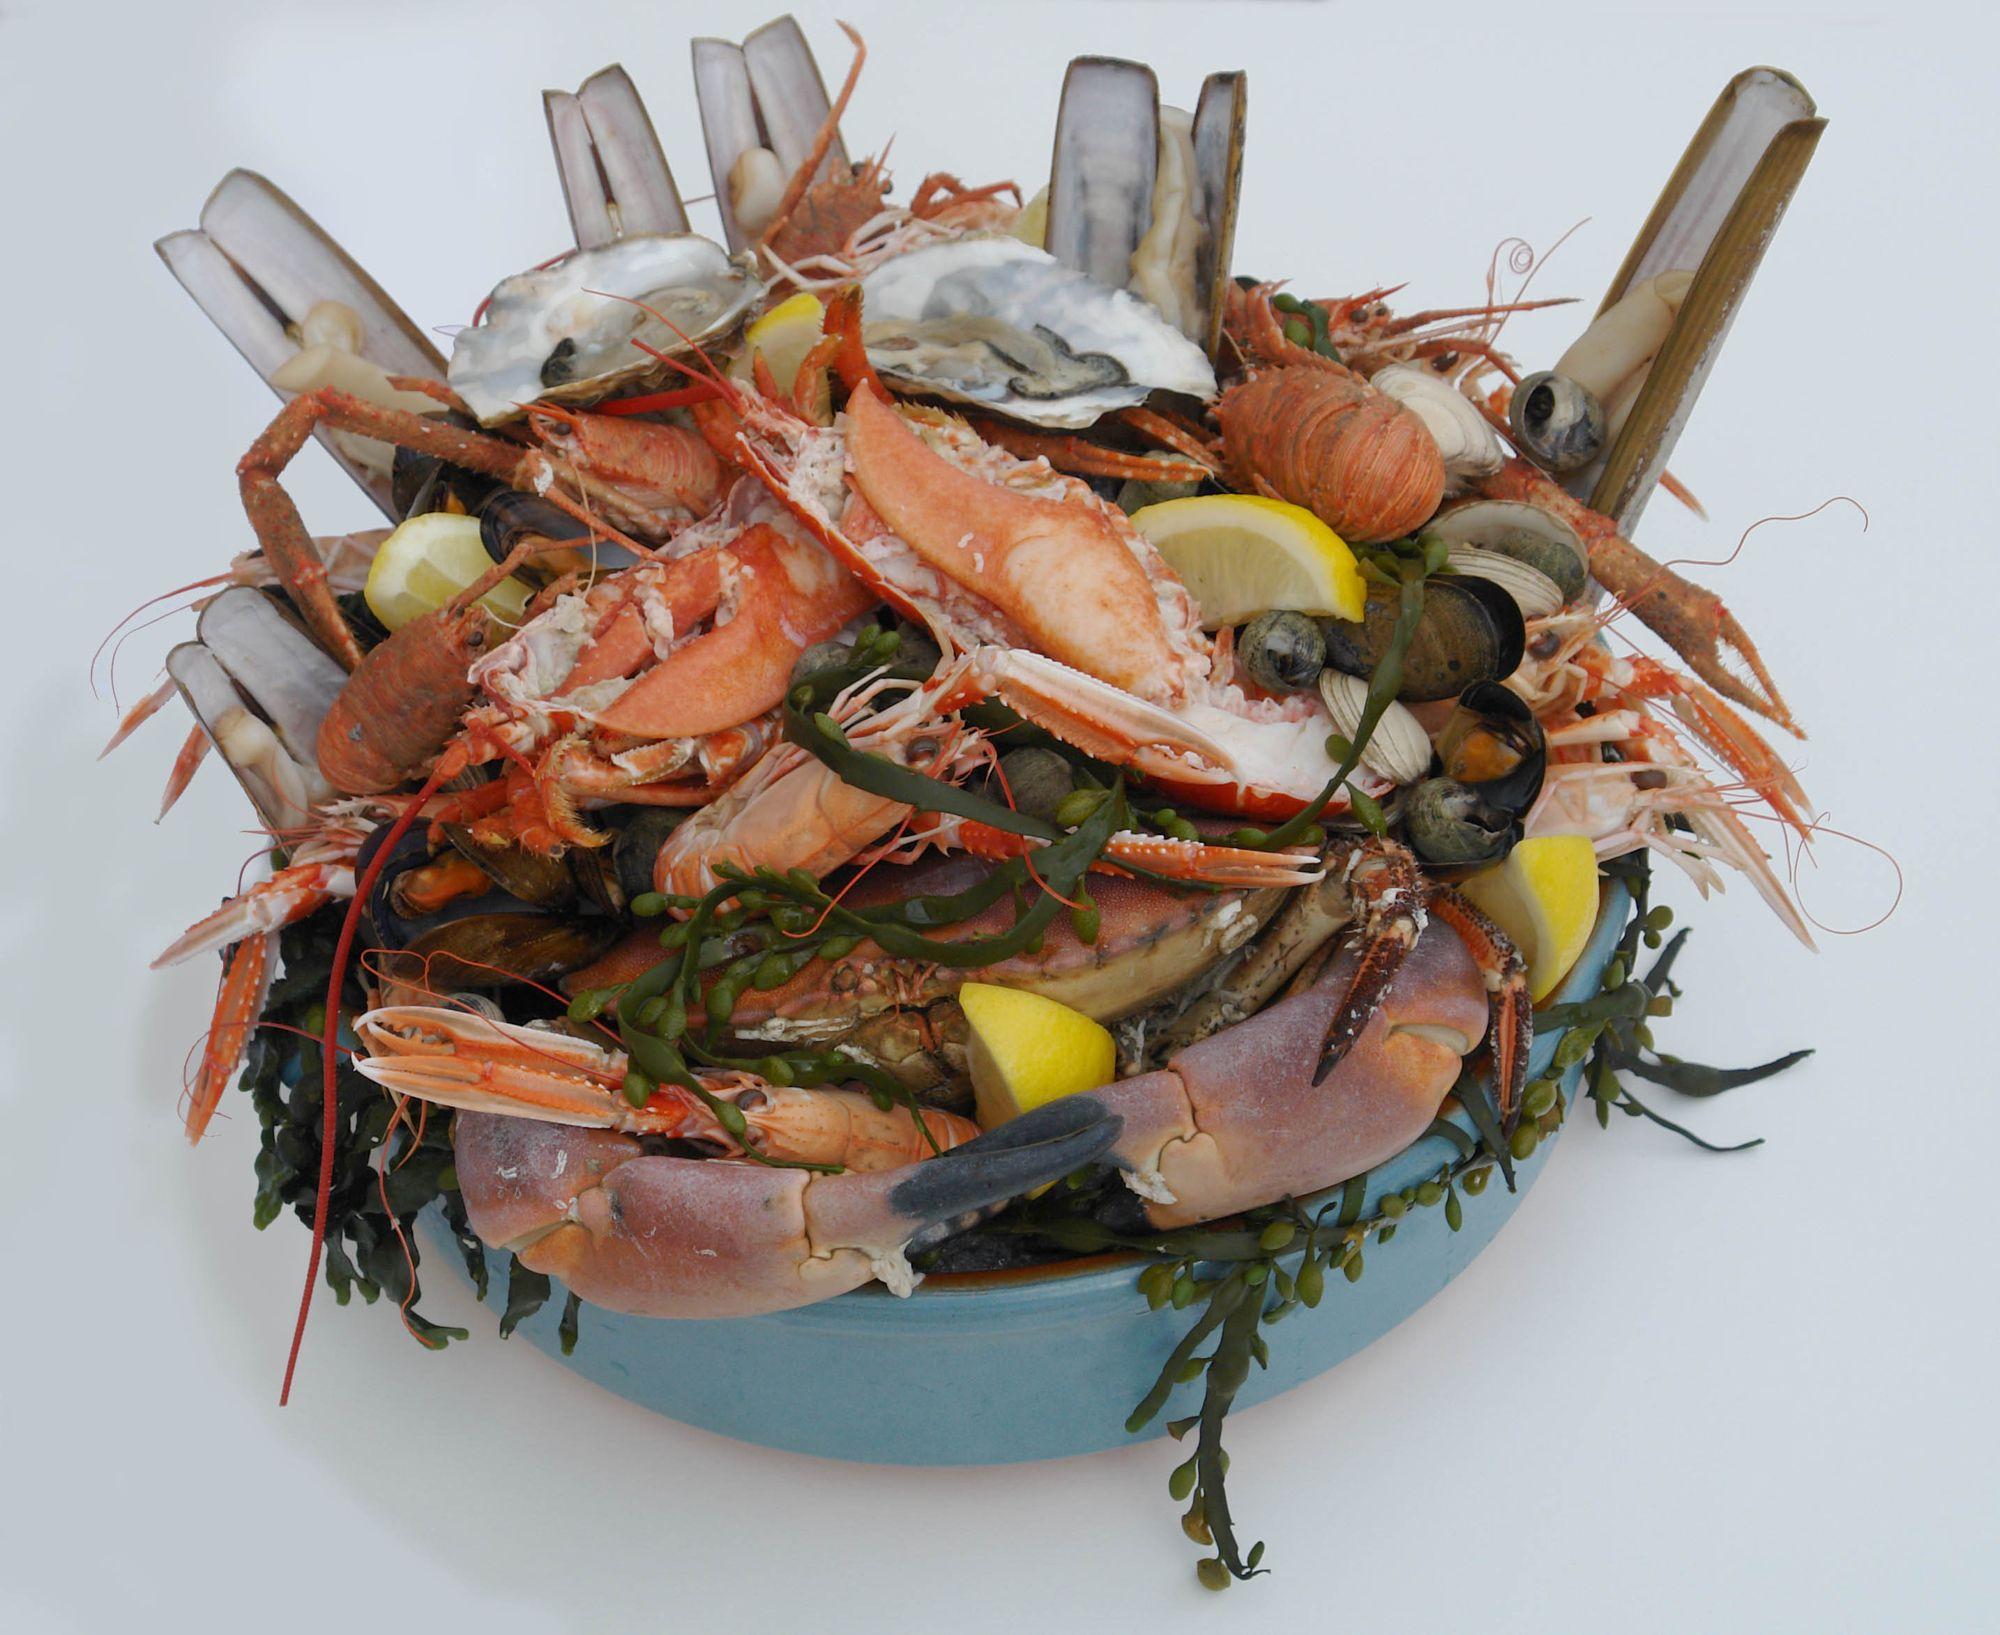 Kinlochleven Seafood Café